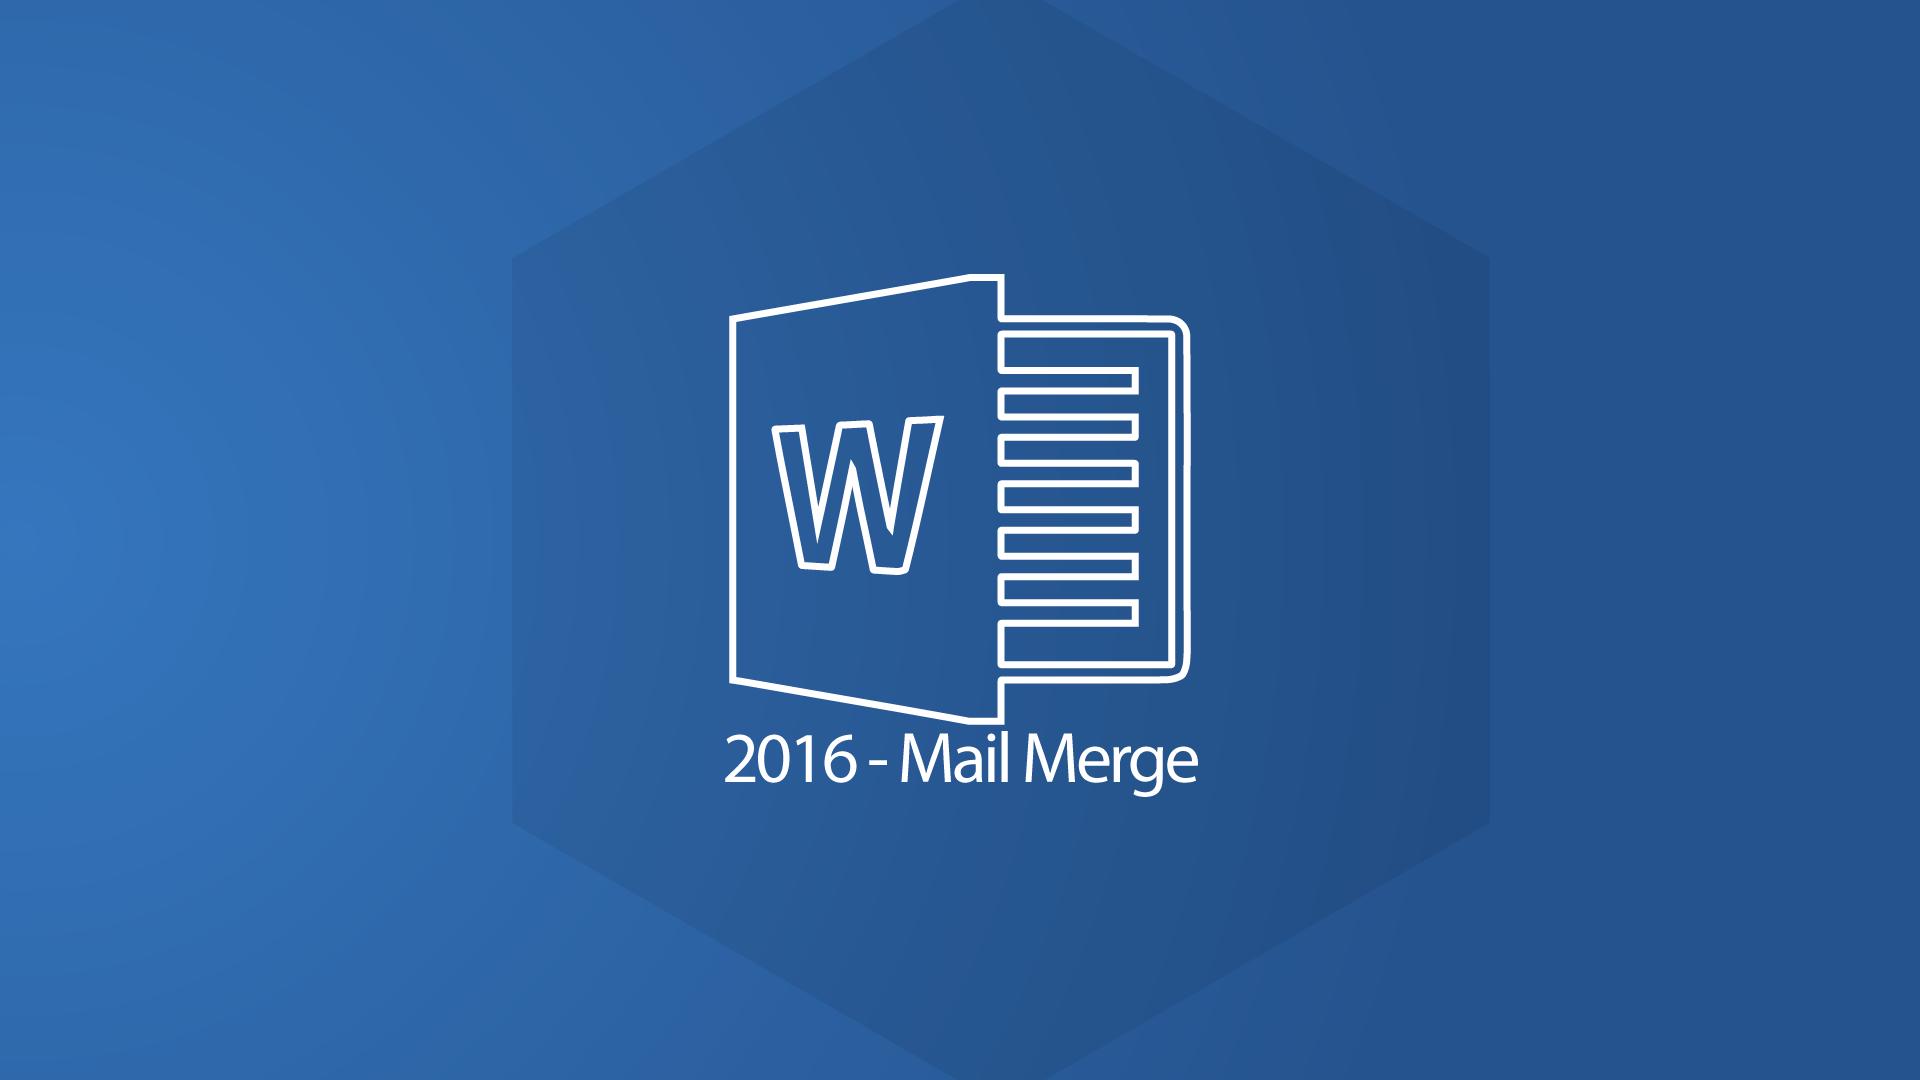 Word 2016 - Mail Merge